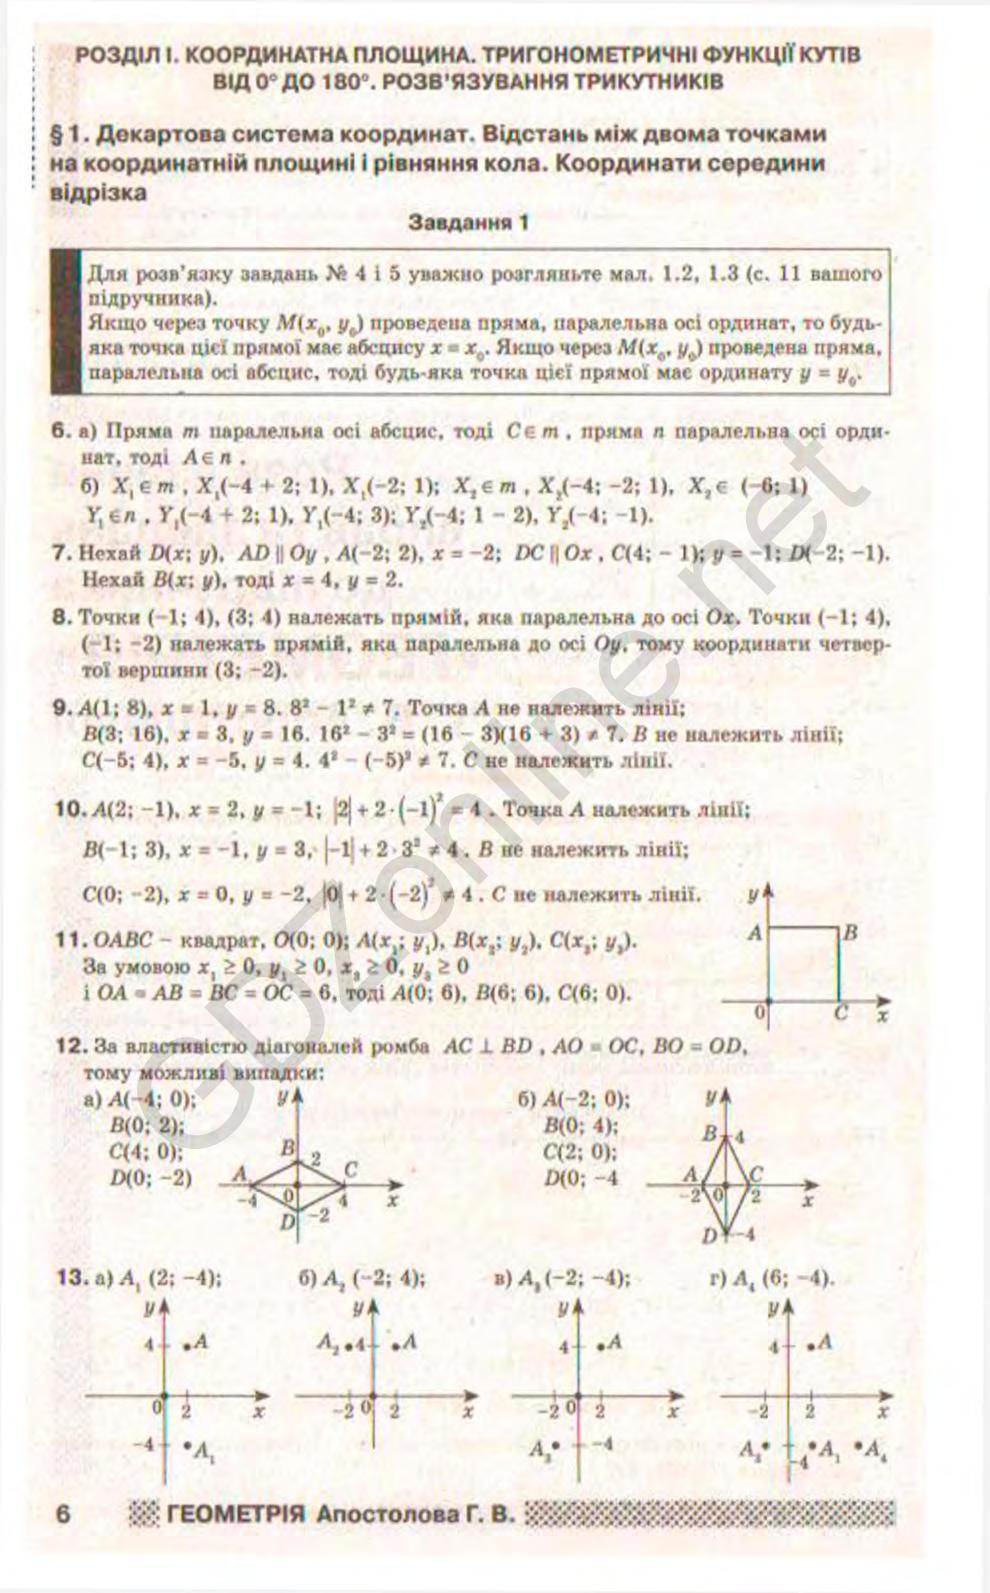 Решебник по геометрии 9 класс апостолова без регистрации